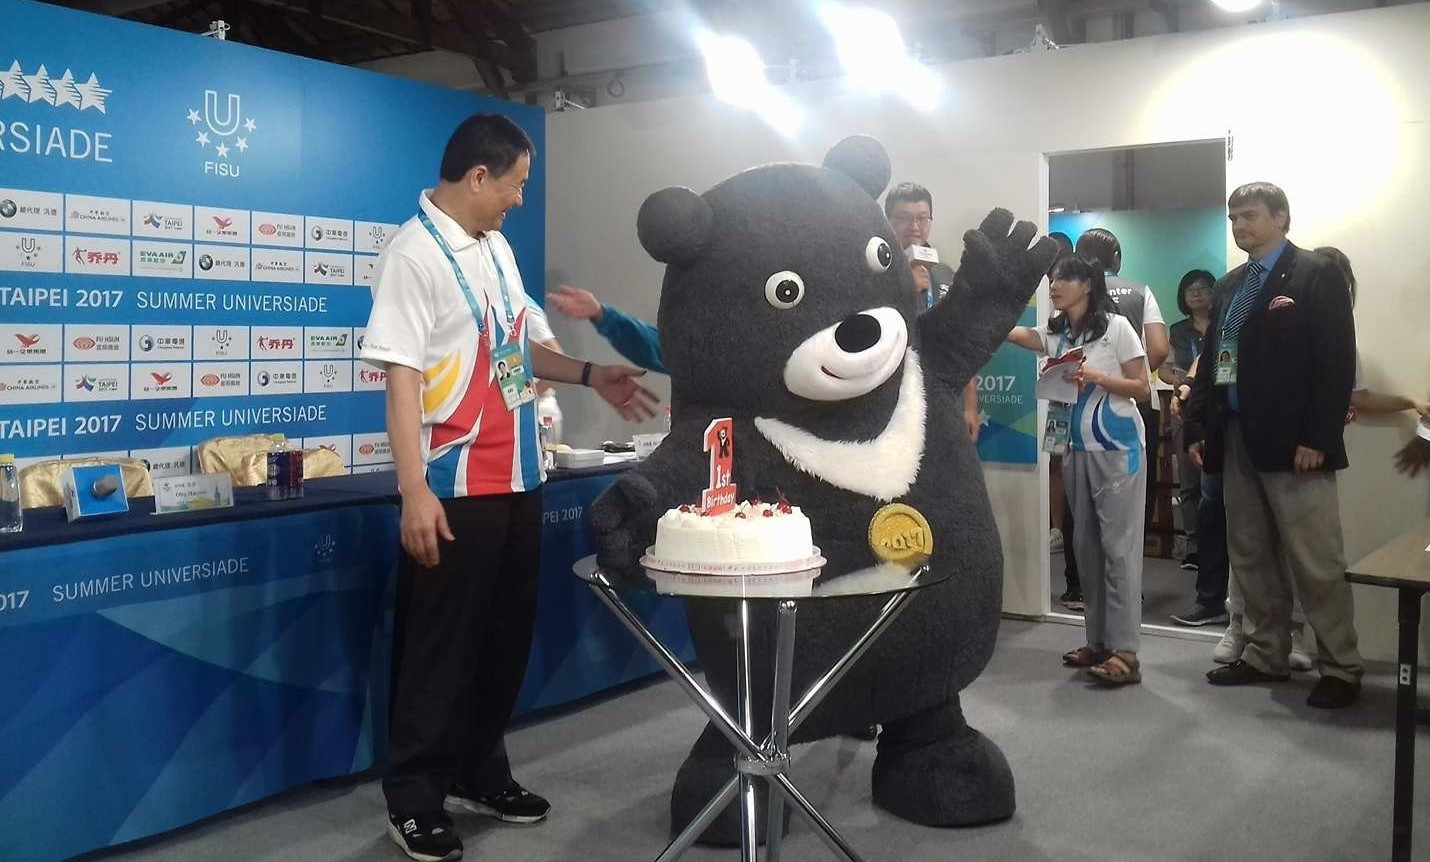 Taipei 2017's Bravo wins FISU mascot contest